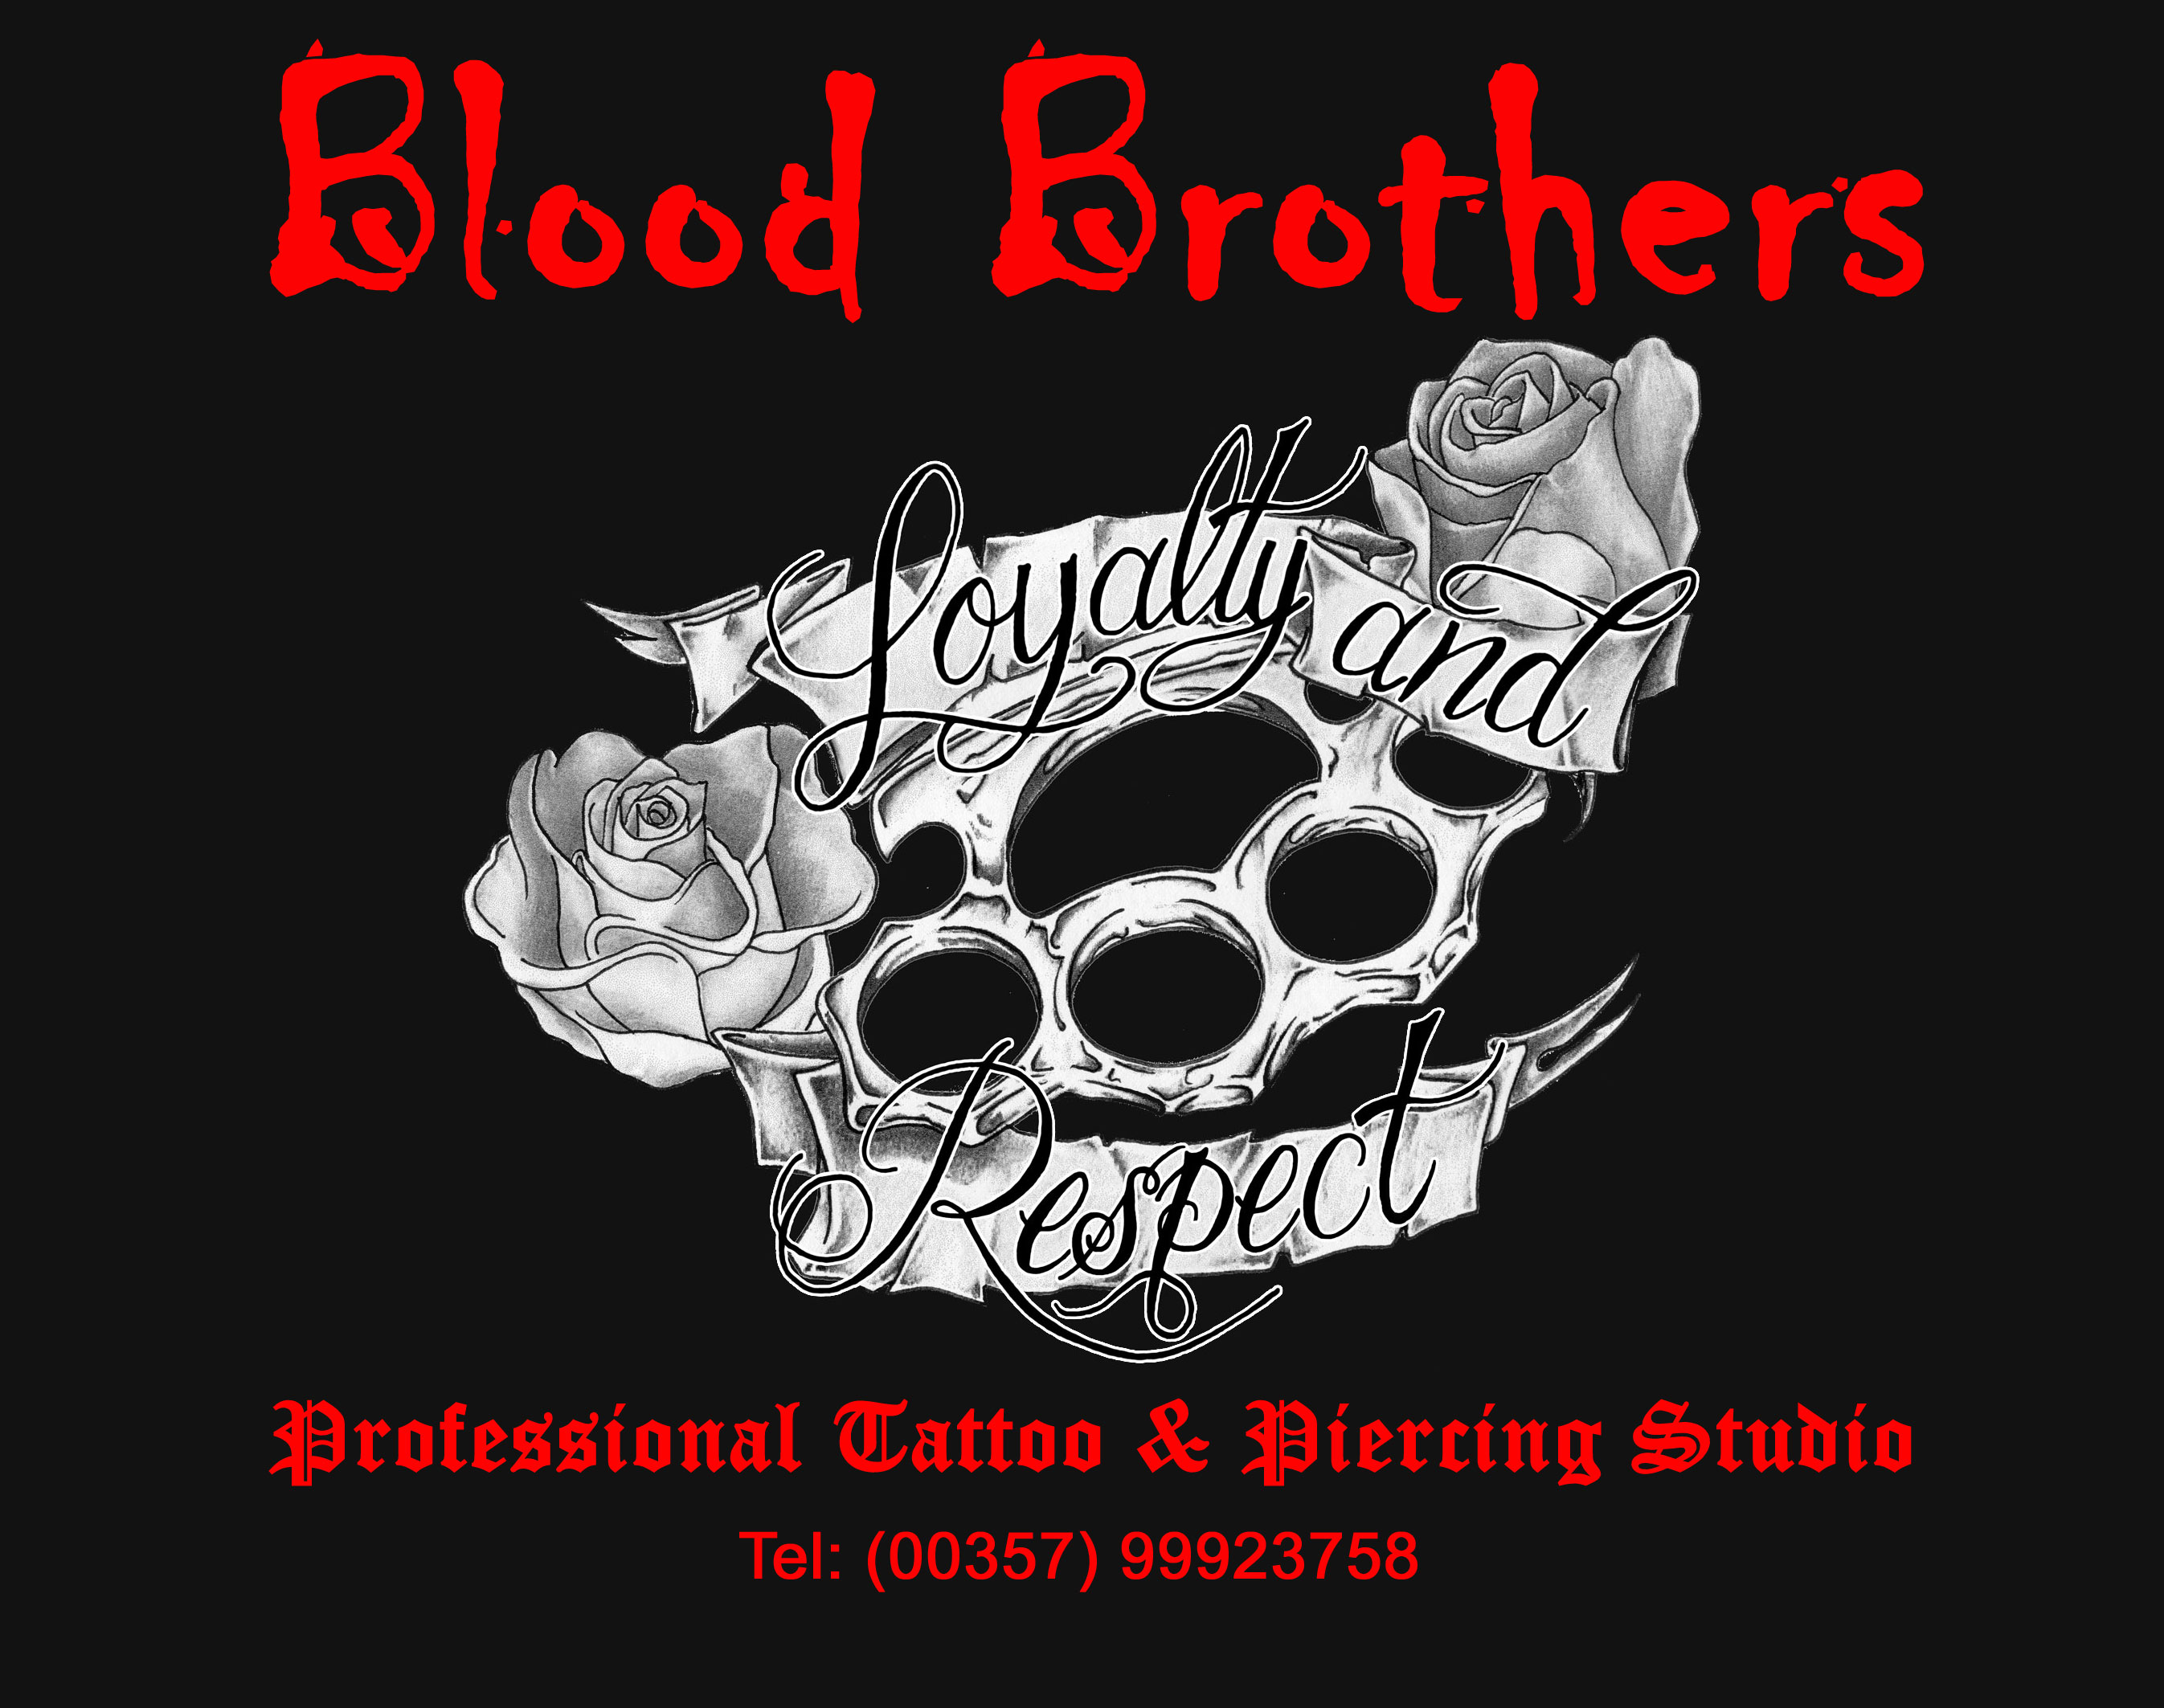 blood brothers tattoos and piercings studio ayia napa cyprus